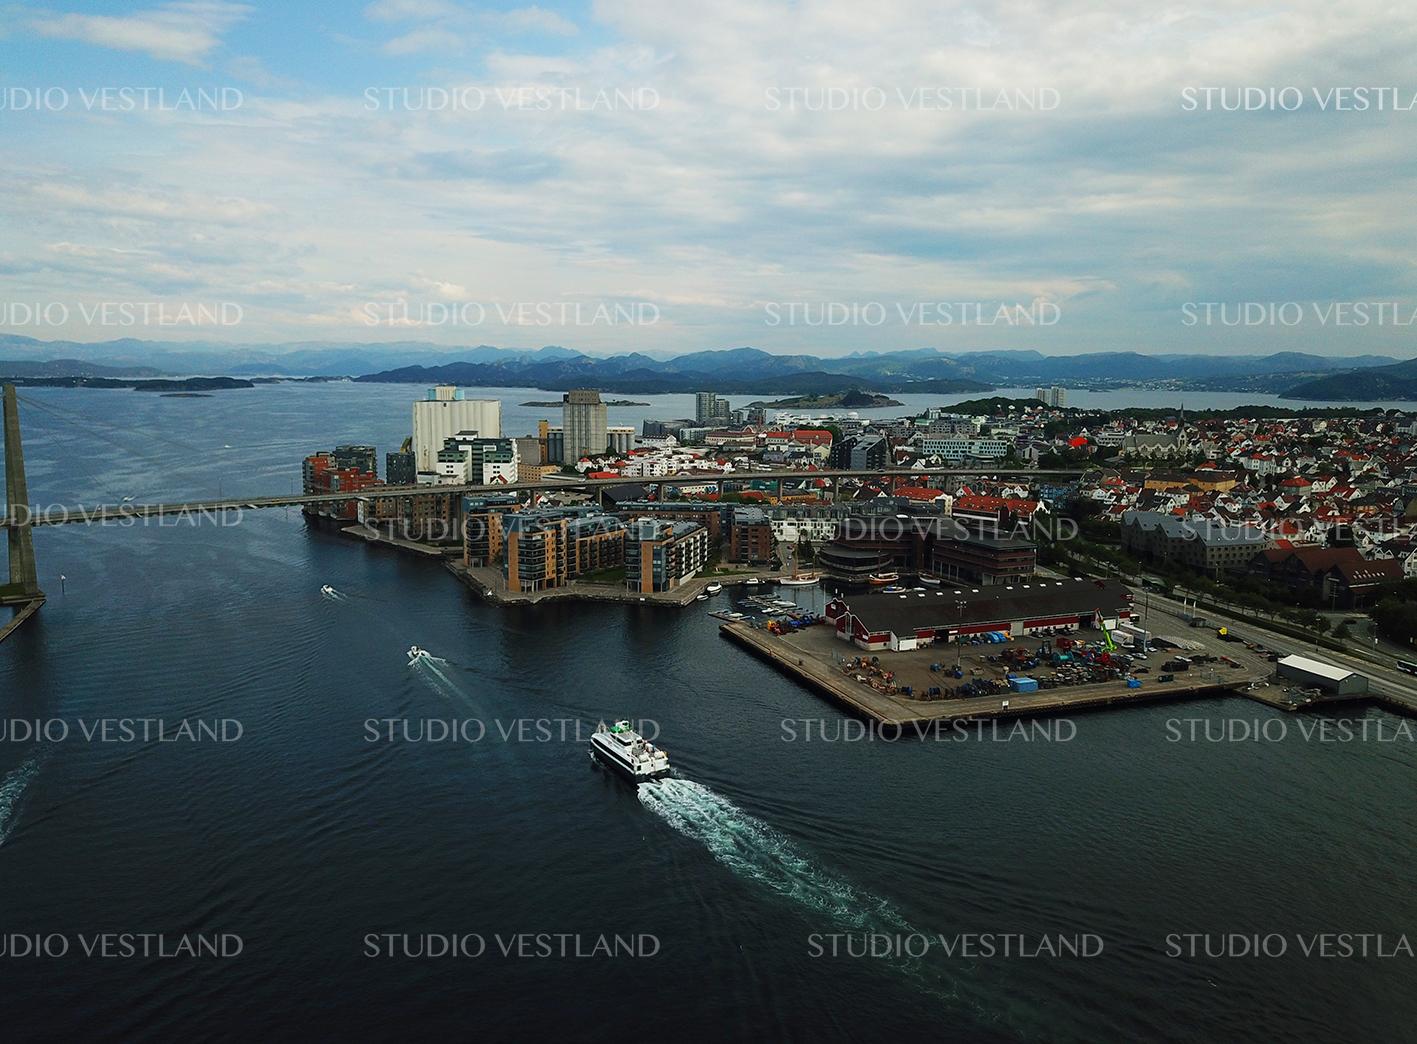 Studio Vestland - Stavanger 21